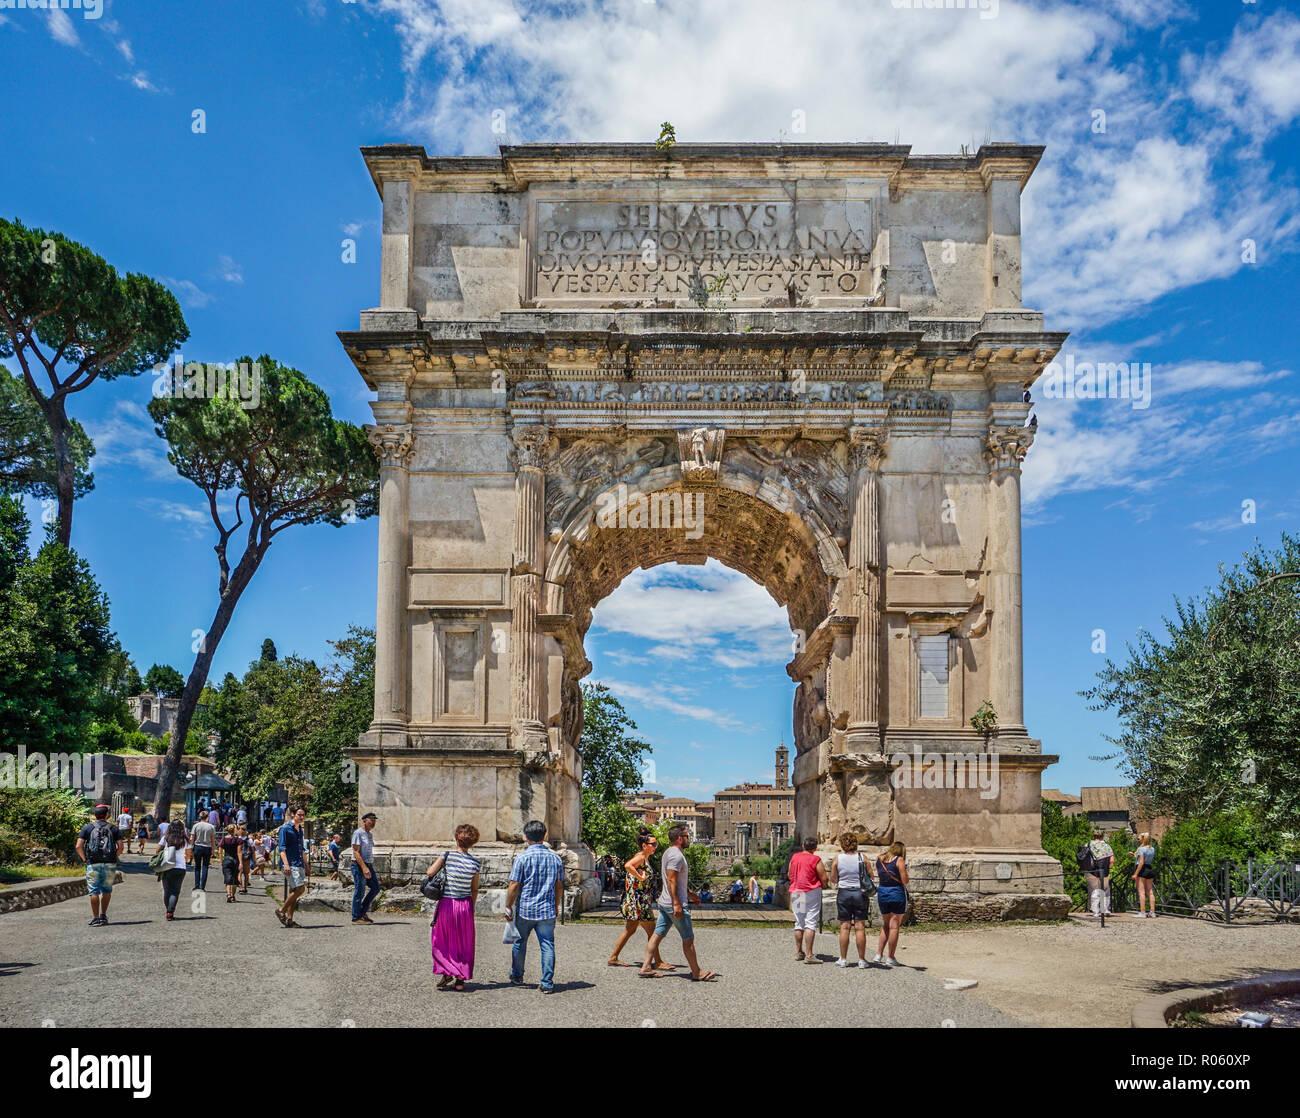 Arch of Titus, a 1st-century AD honoriric Roman arch on the Via Sacra leading into the Roman Forum, Rome, Italy - Stock Image